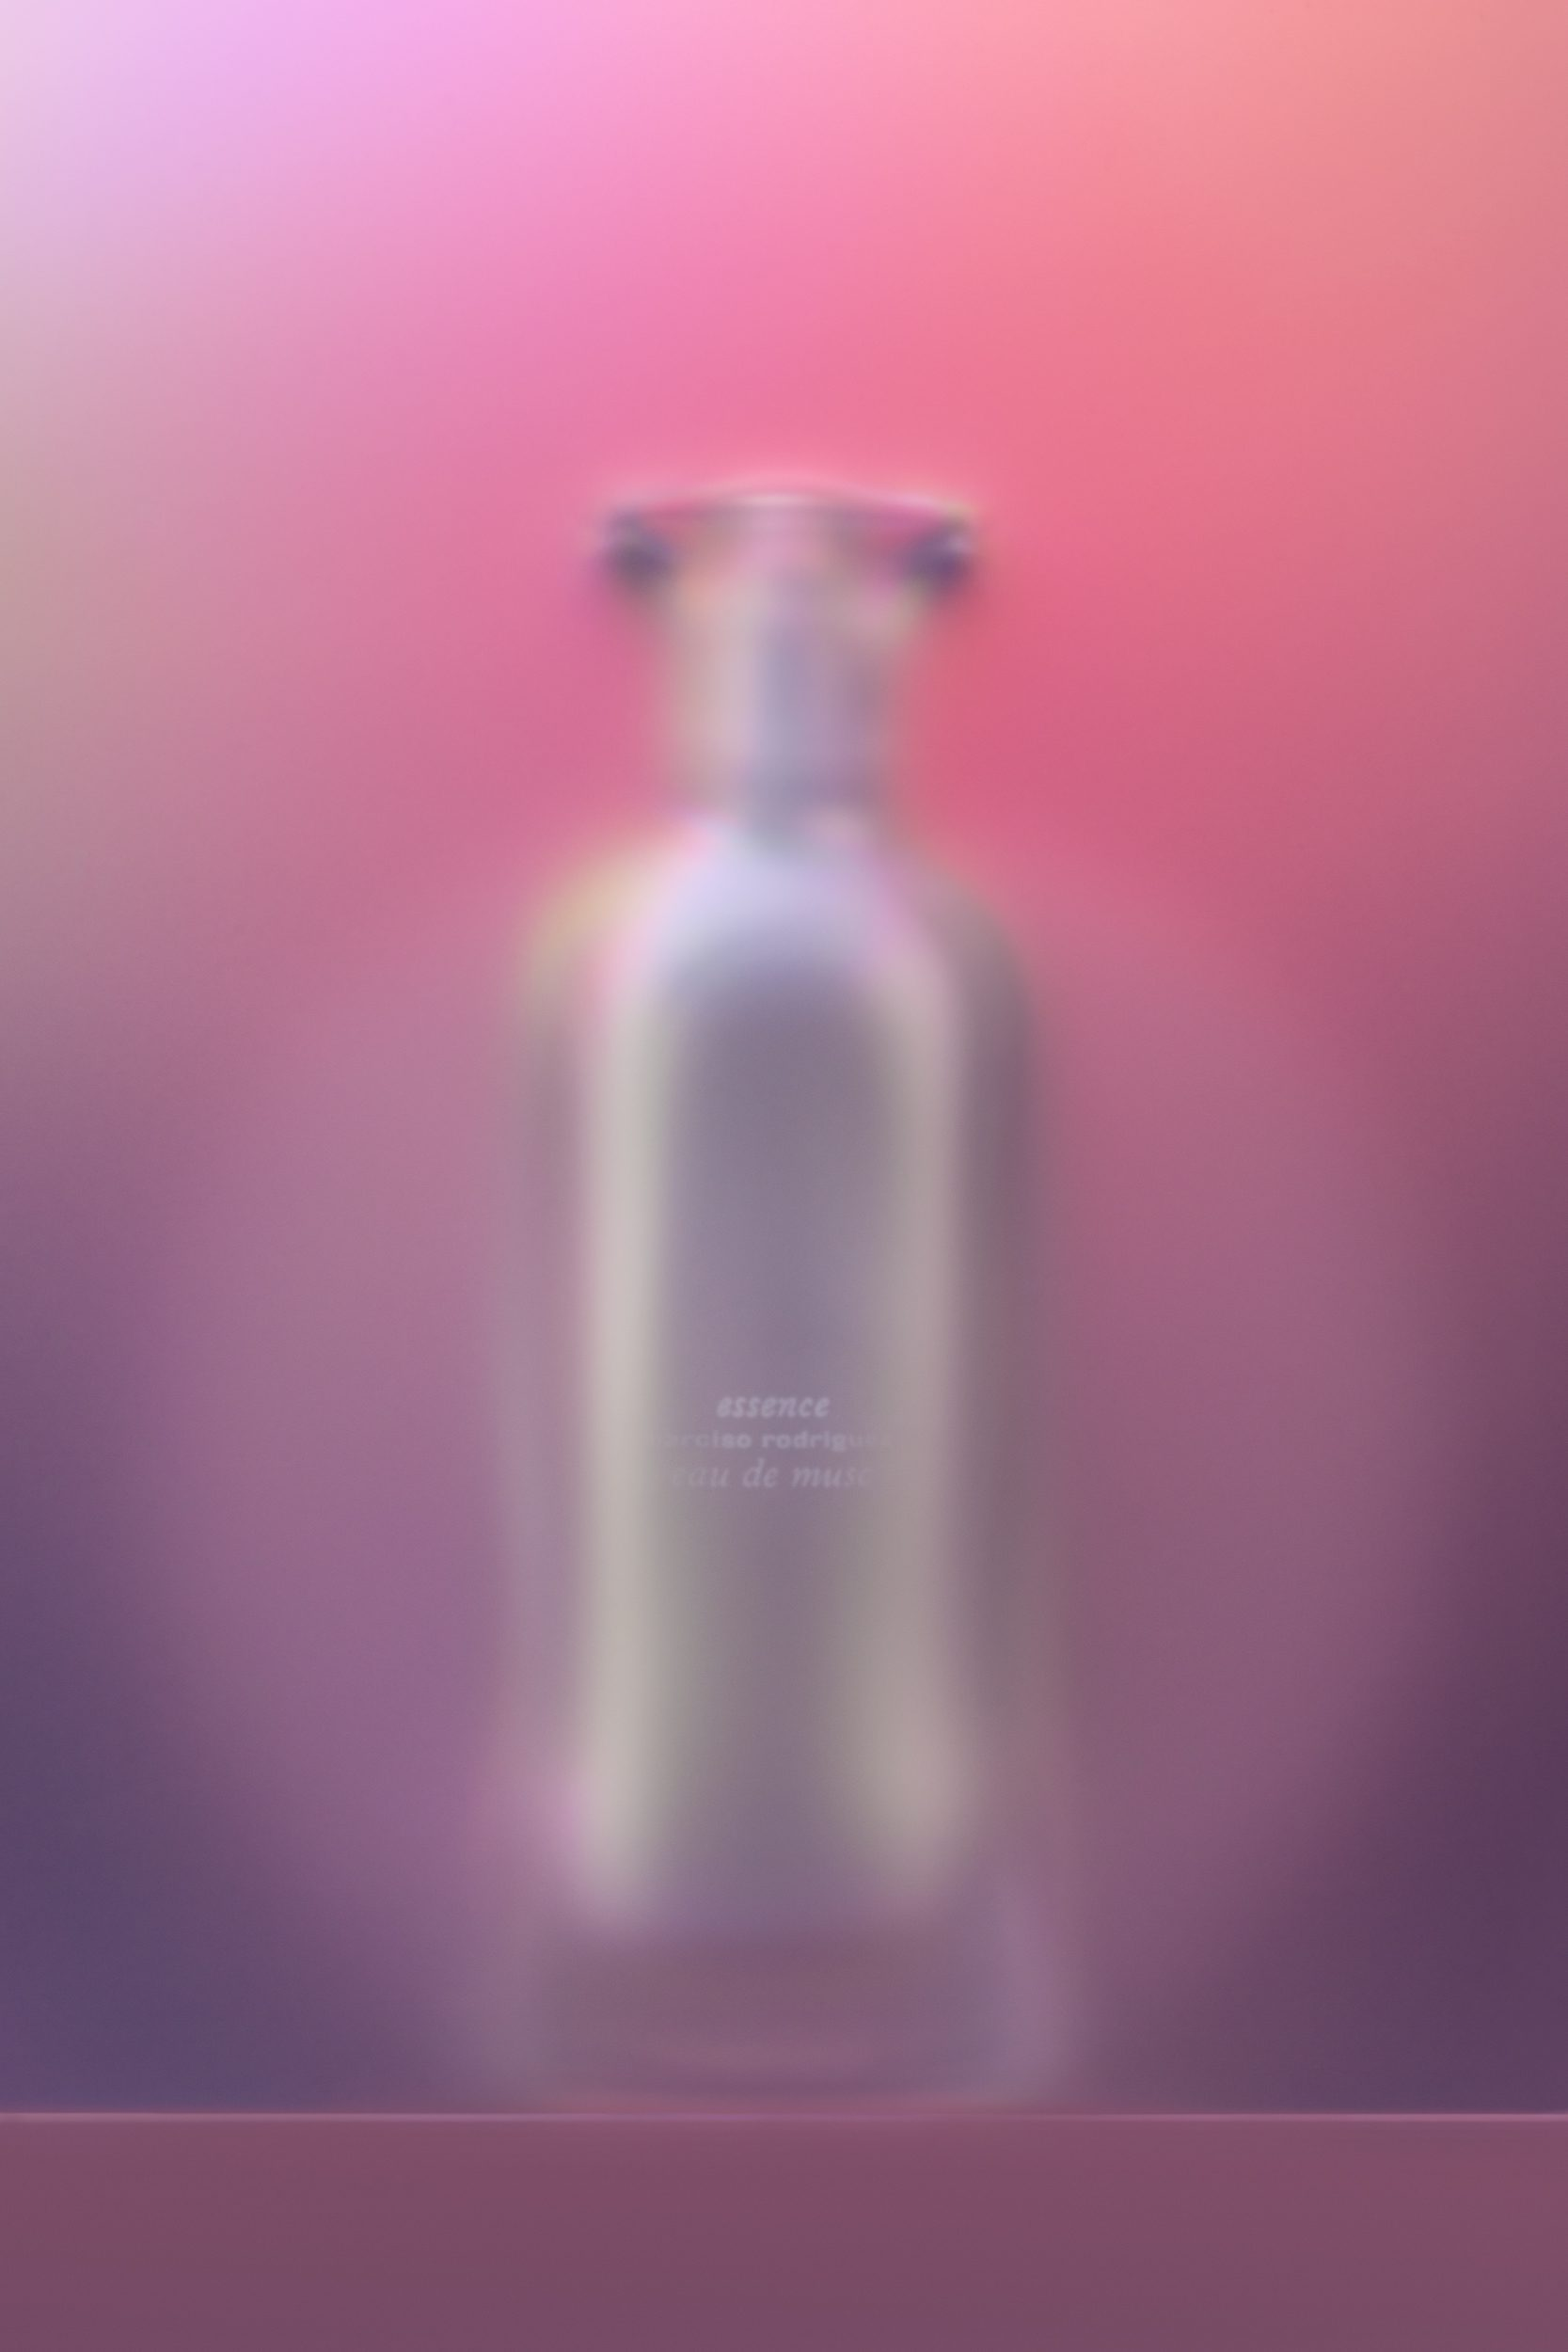 Narciso_Rodriguez-Essence-Eau-de-Musc-SH_01-02©Aivaras_Simonis